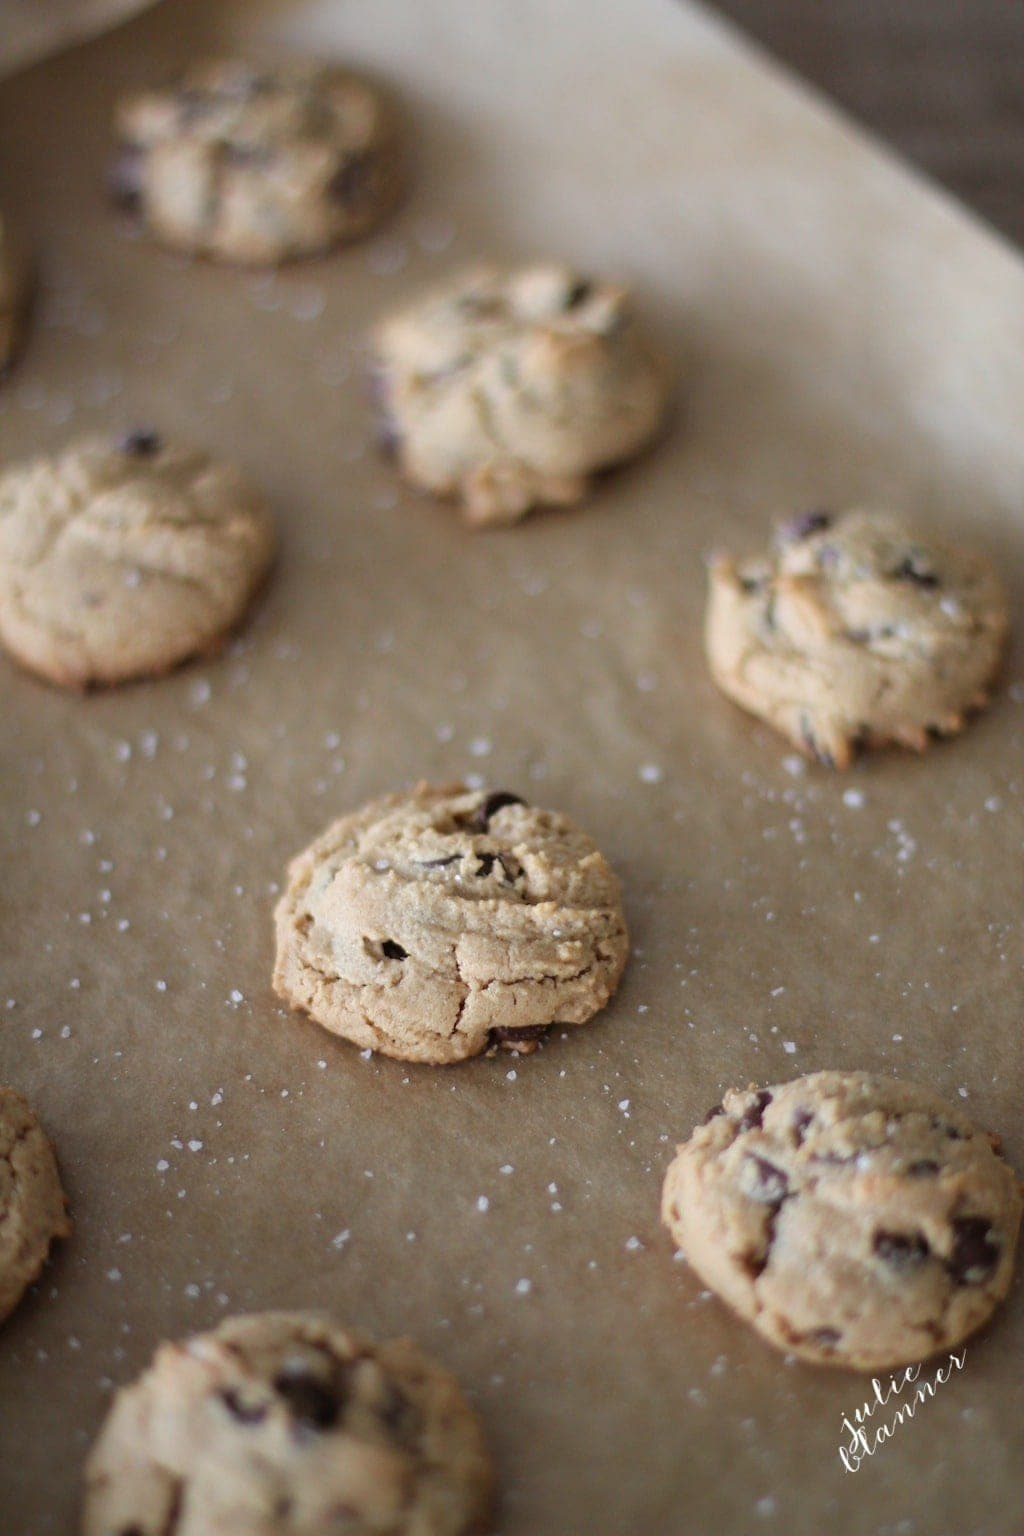 Gluten Free Peanut Butter Chocolate Chip Cookie recipe